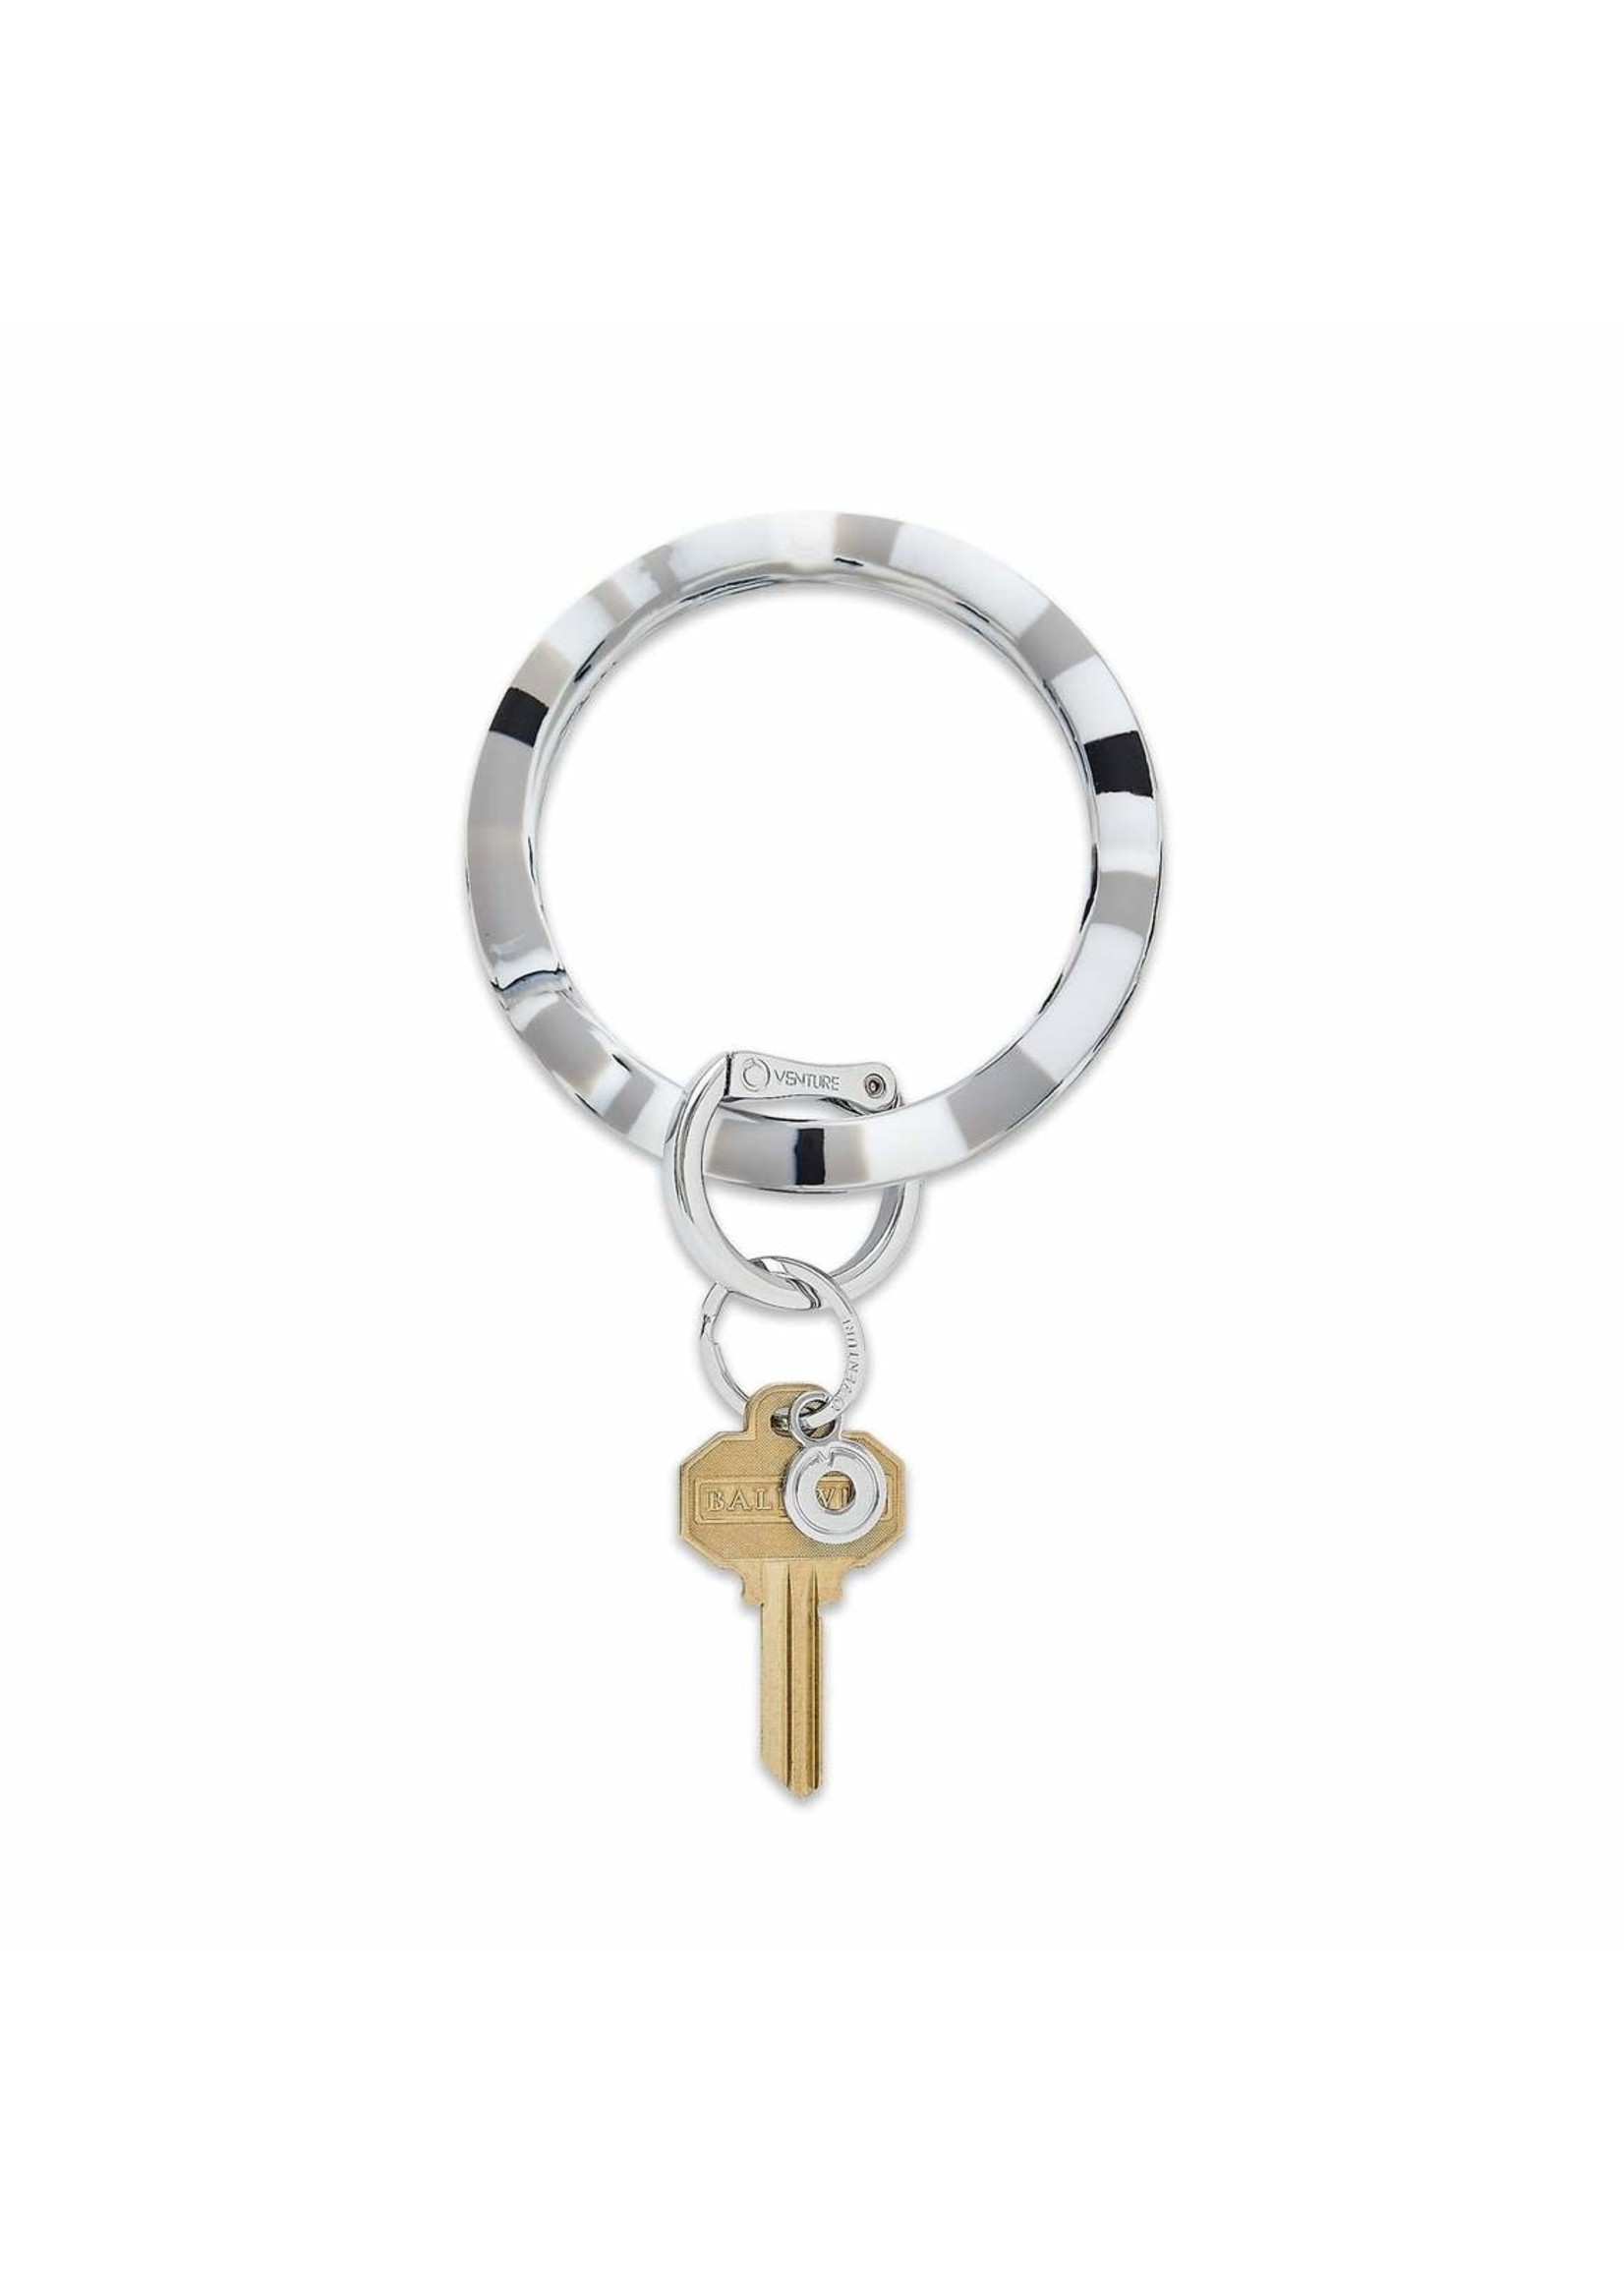 O-venture Silicone Key Ring - Tuxedo Marble